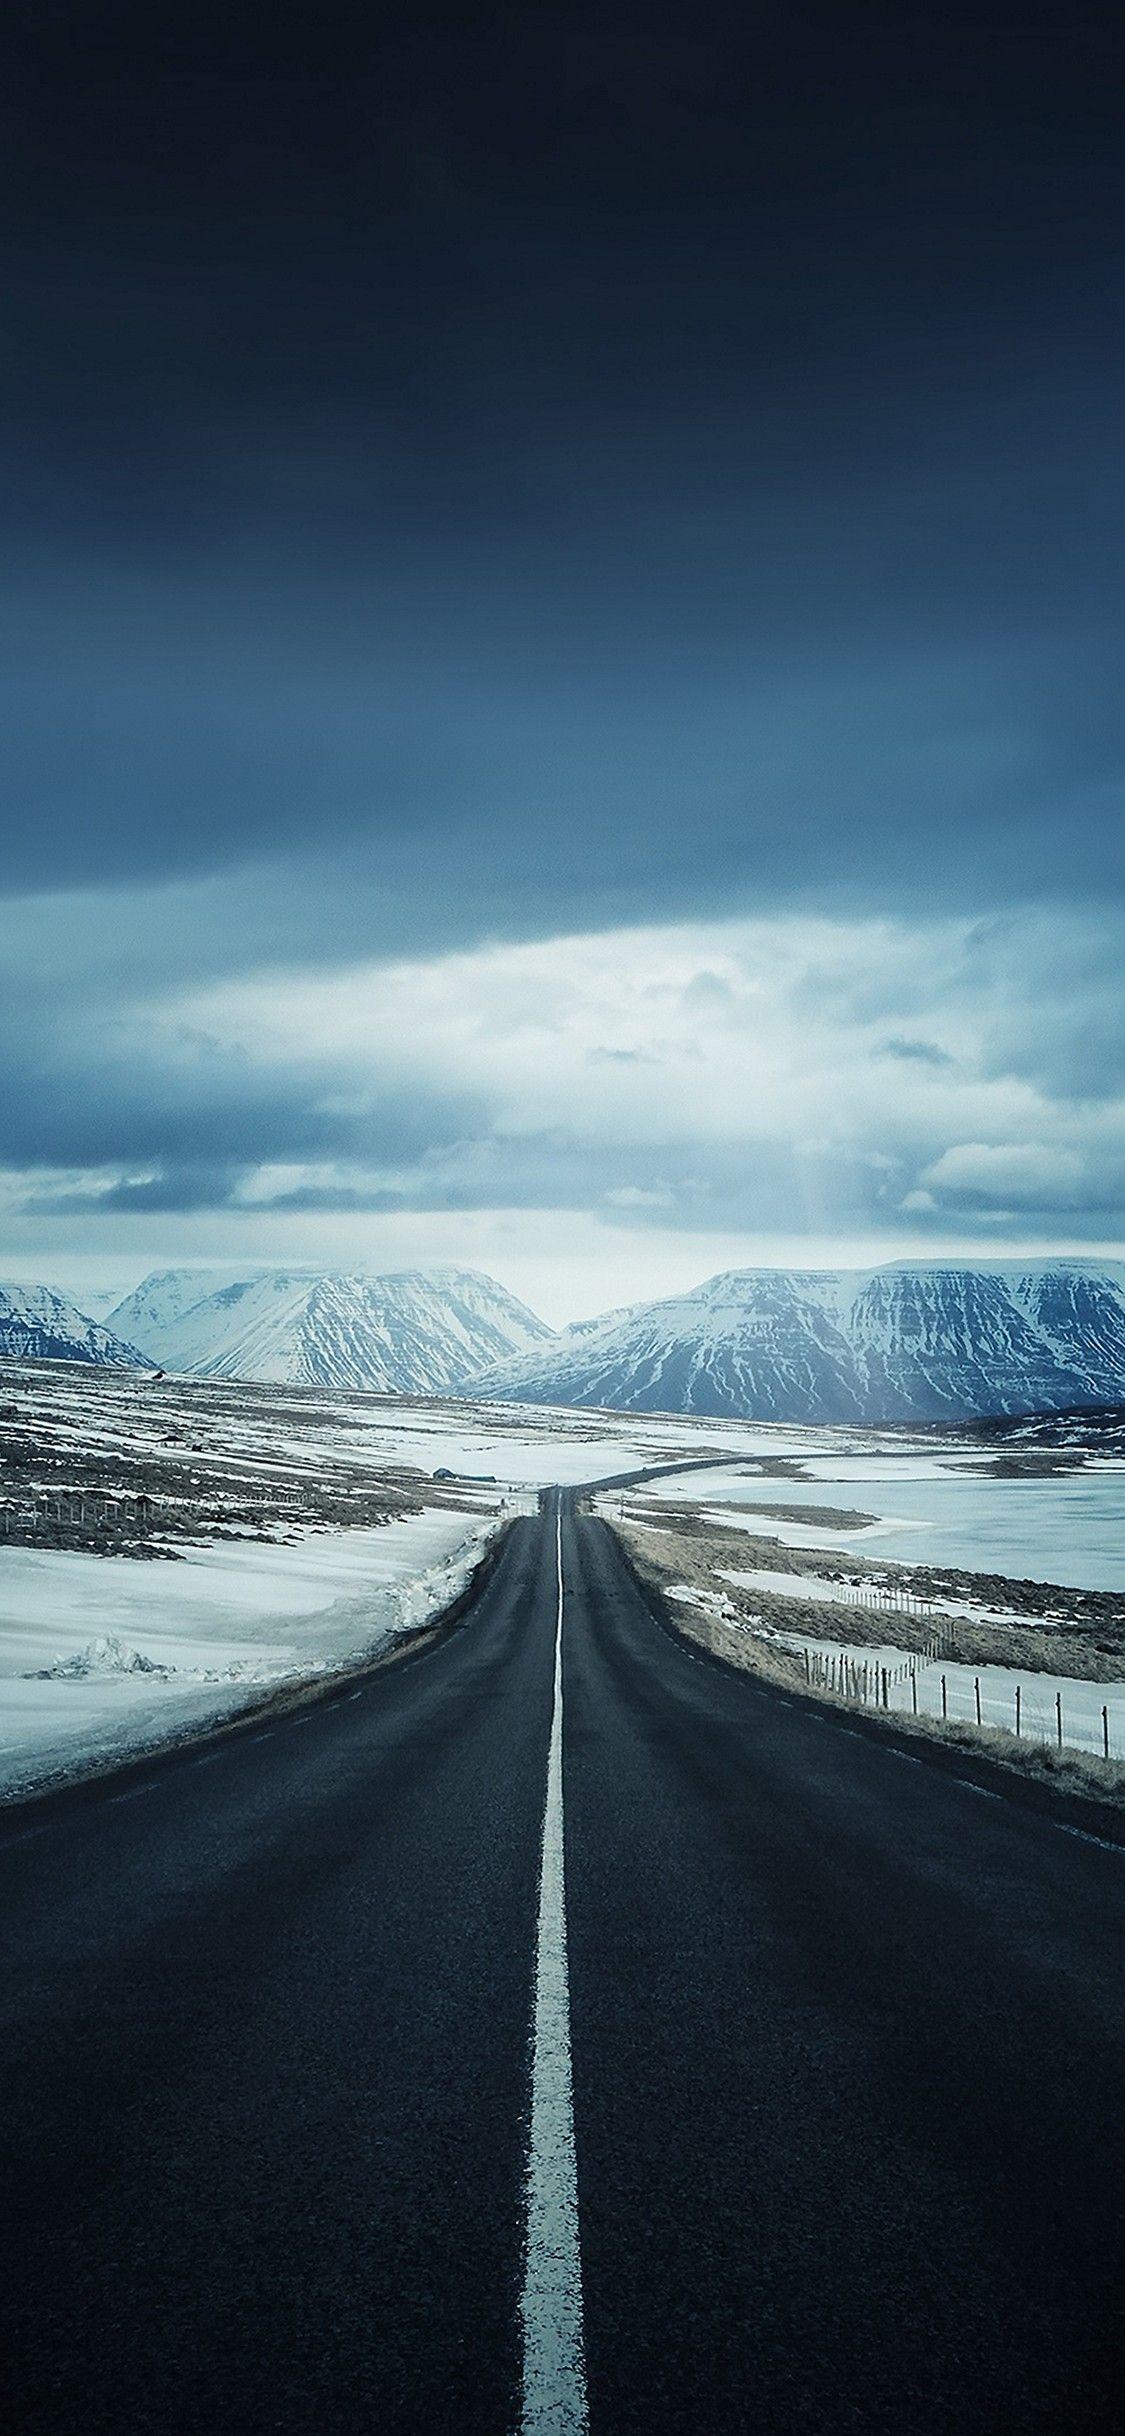 Winter Road Hd Wallpaper 1125x2436 Travel Wallpaper Beautiful Roads Scenery